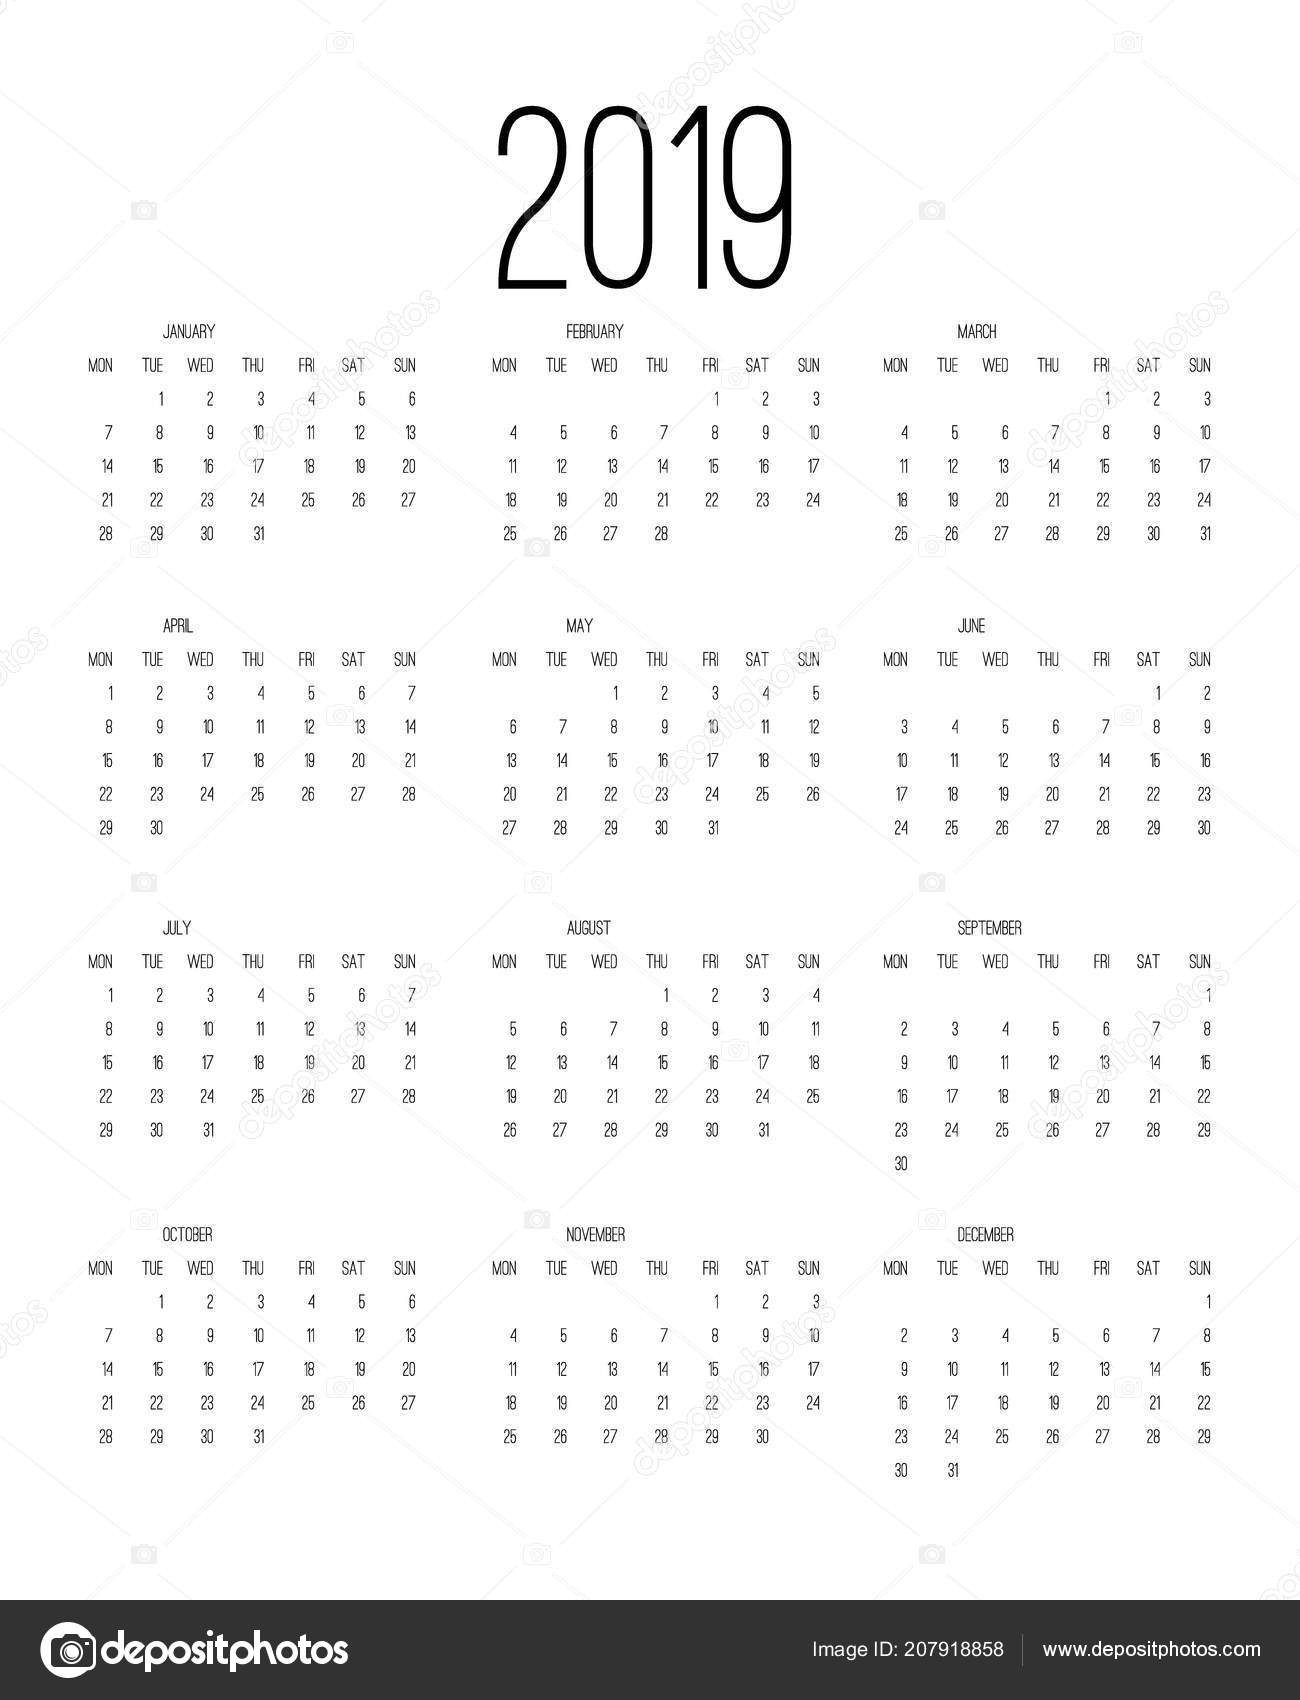 Calendario sobremesa Imprimir Más Caliente Calendario Festivos Colombia 2019 Takvim Kalender Hd